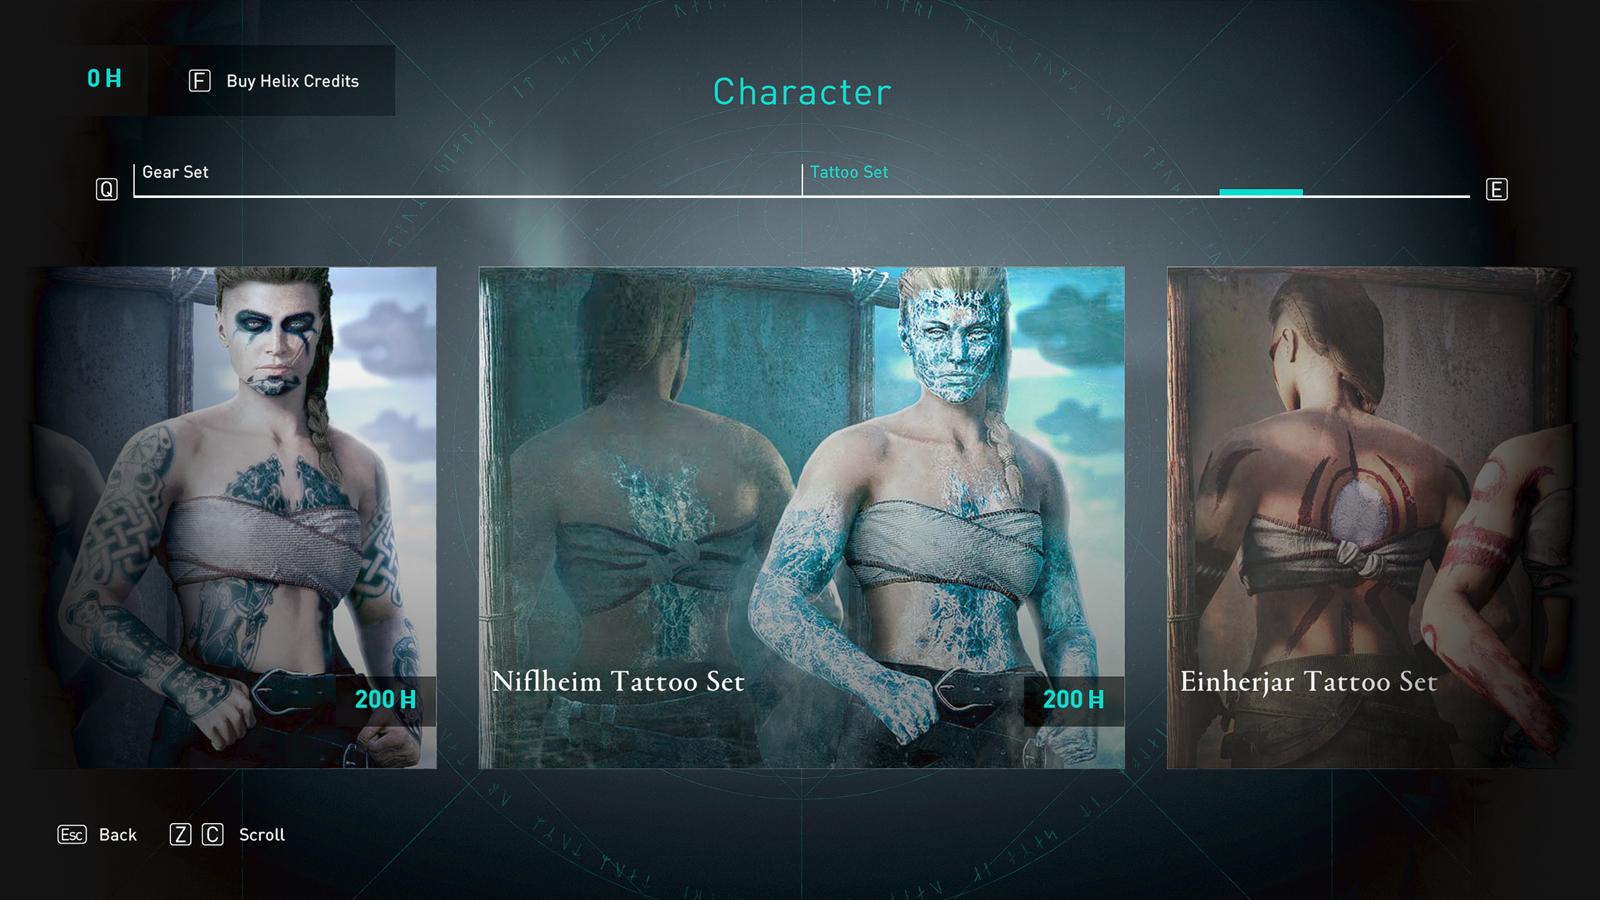 Niflheim Tattoo Set in Assassin's Creed Valhalla store